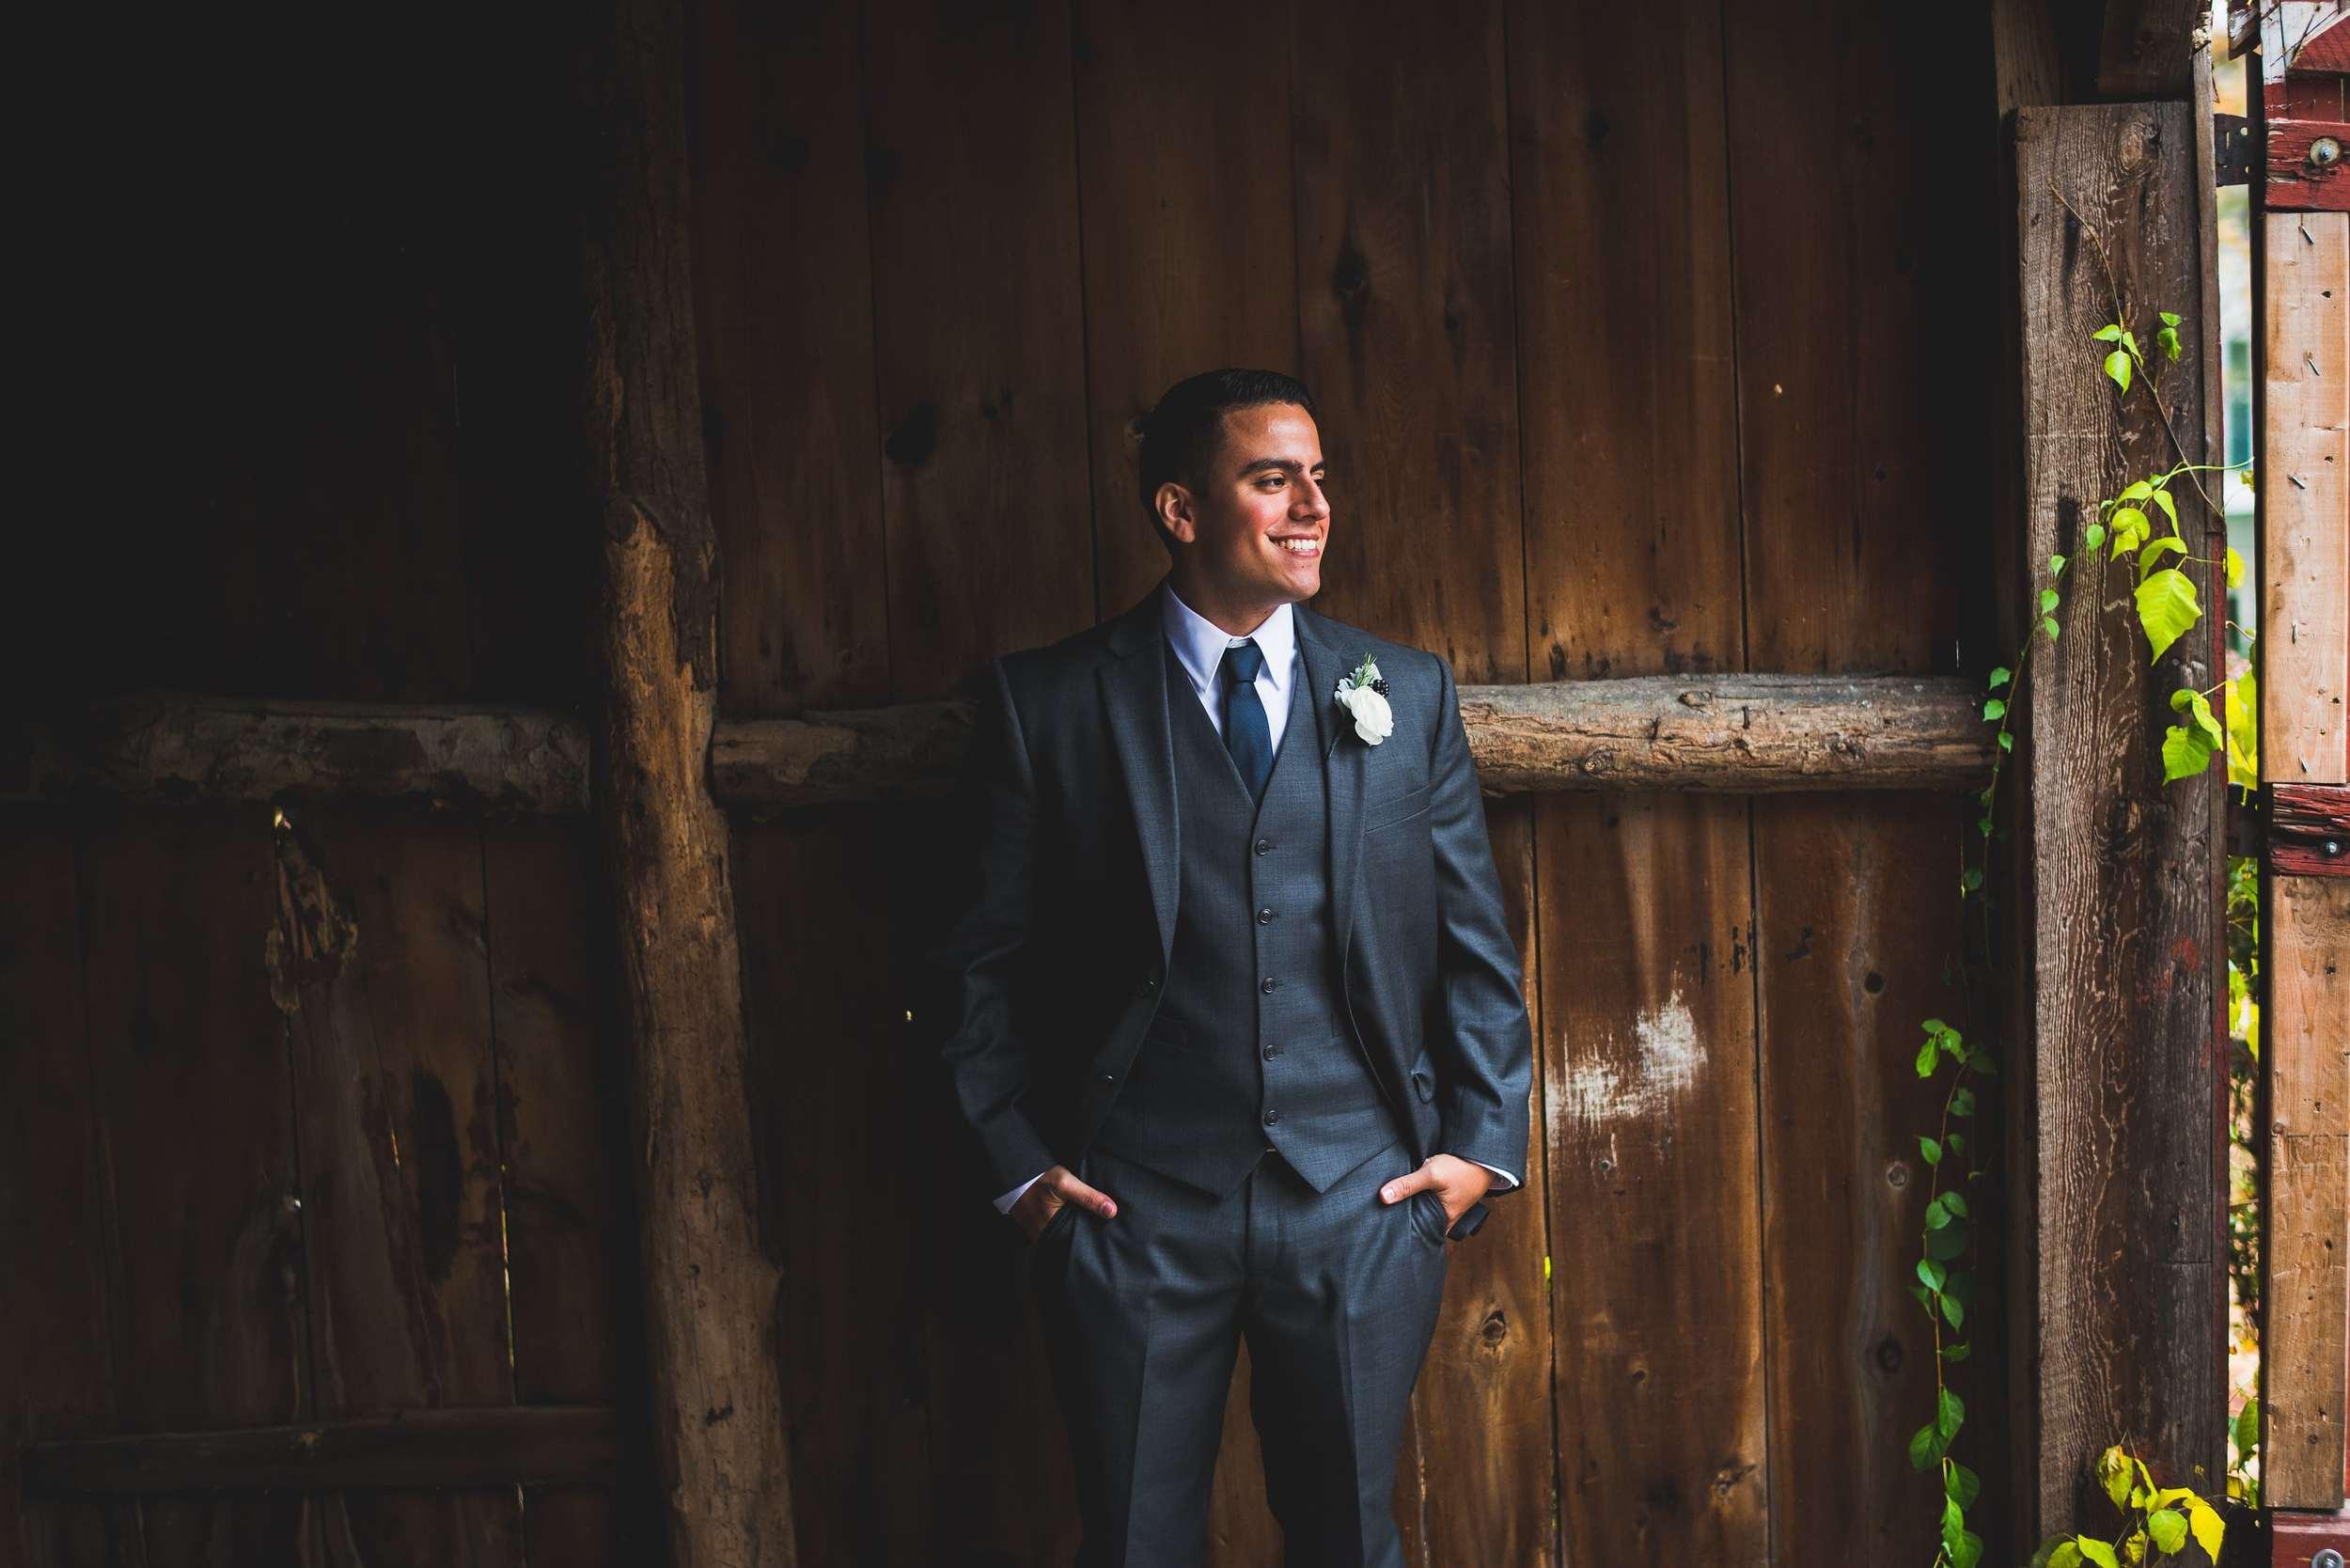 New-York-Wedding-Photographer-Falkirk-Wedding(49of163)-min.jpg